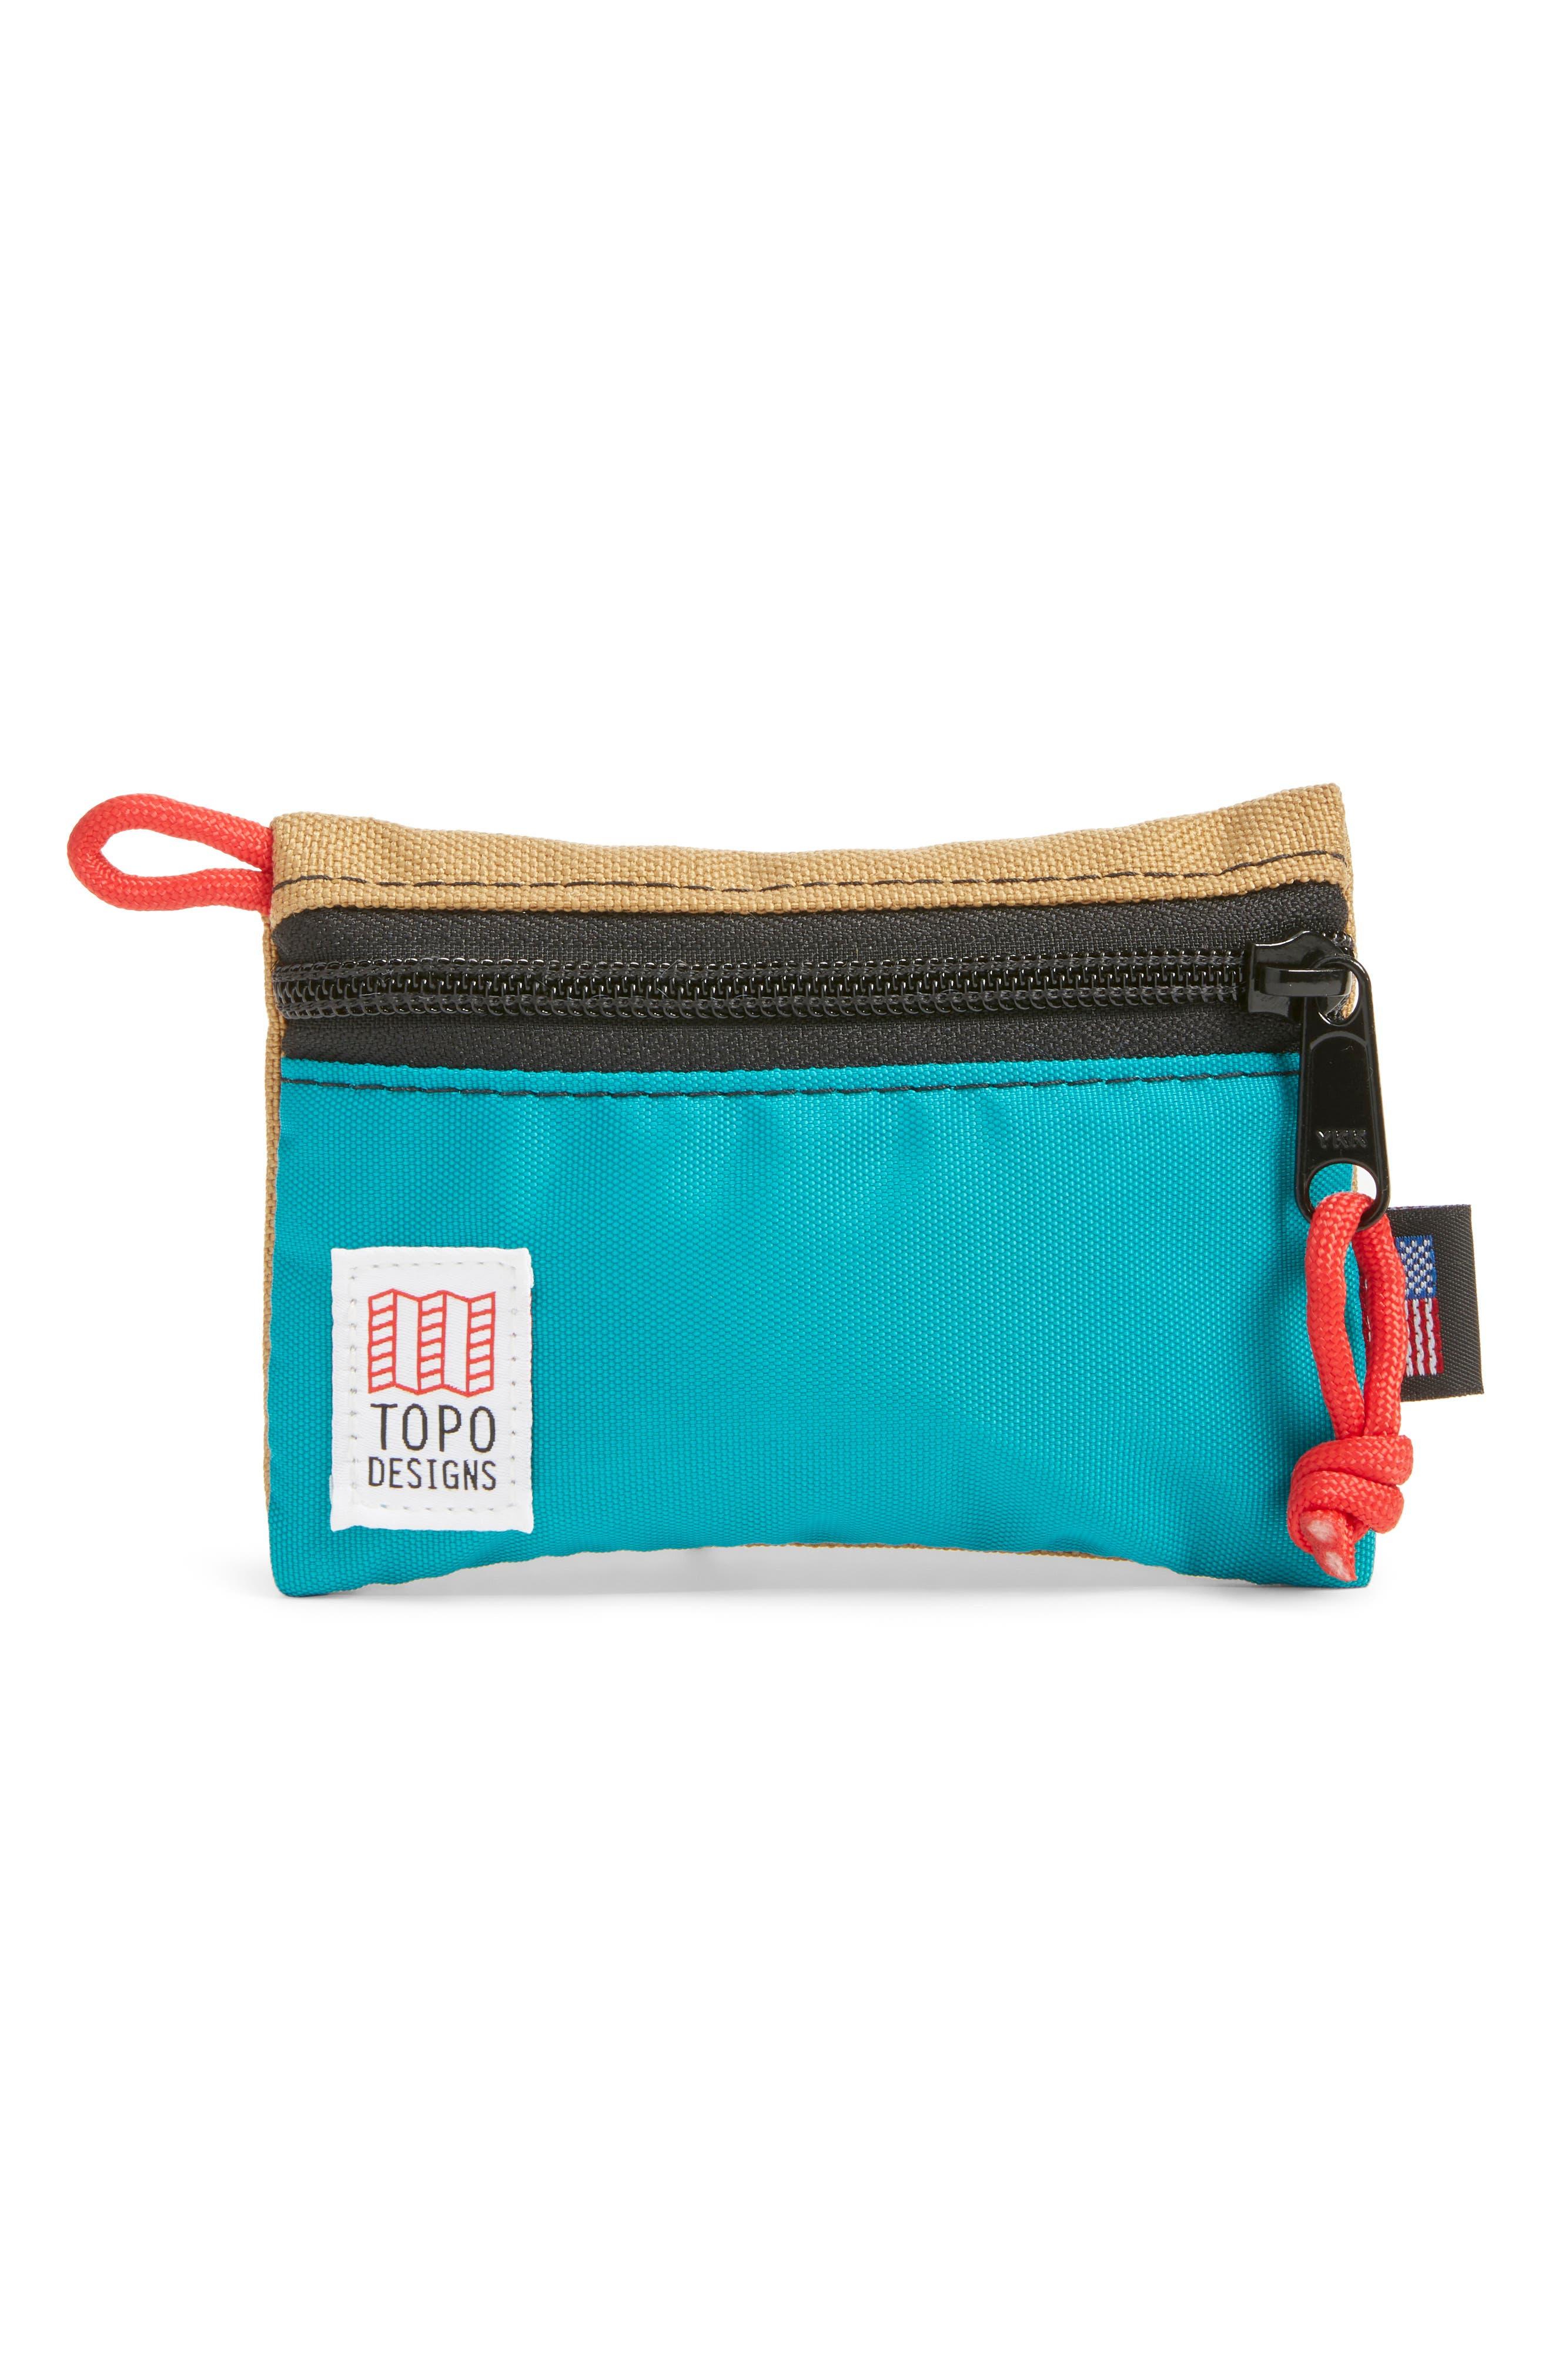 Accessory Bag,                             Main thumbnail 1, color,                             KHAKI/ TURQUOISE